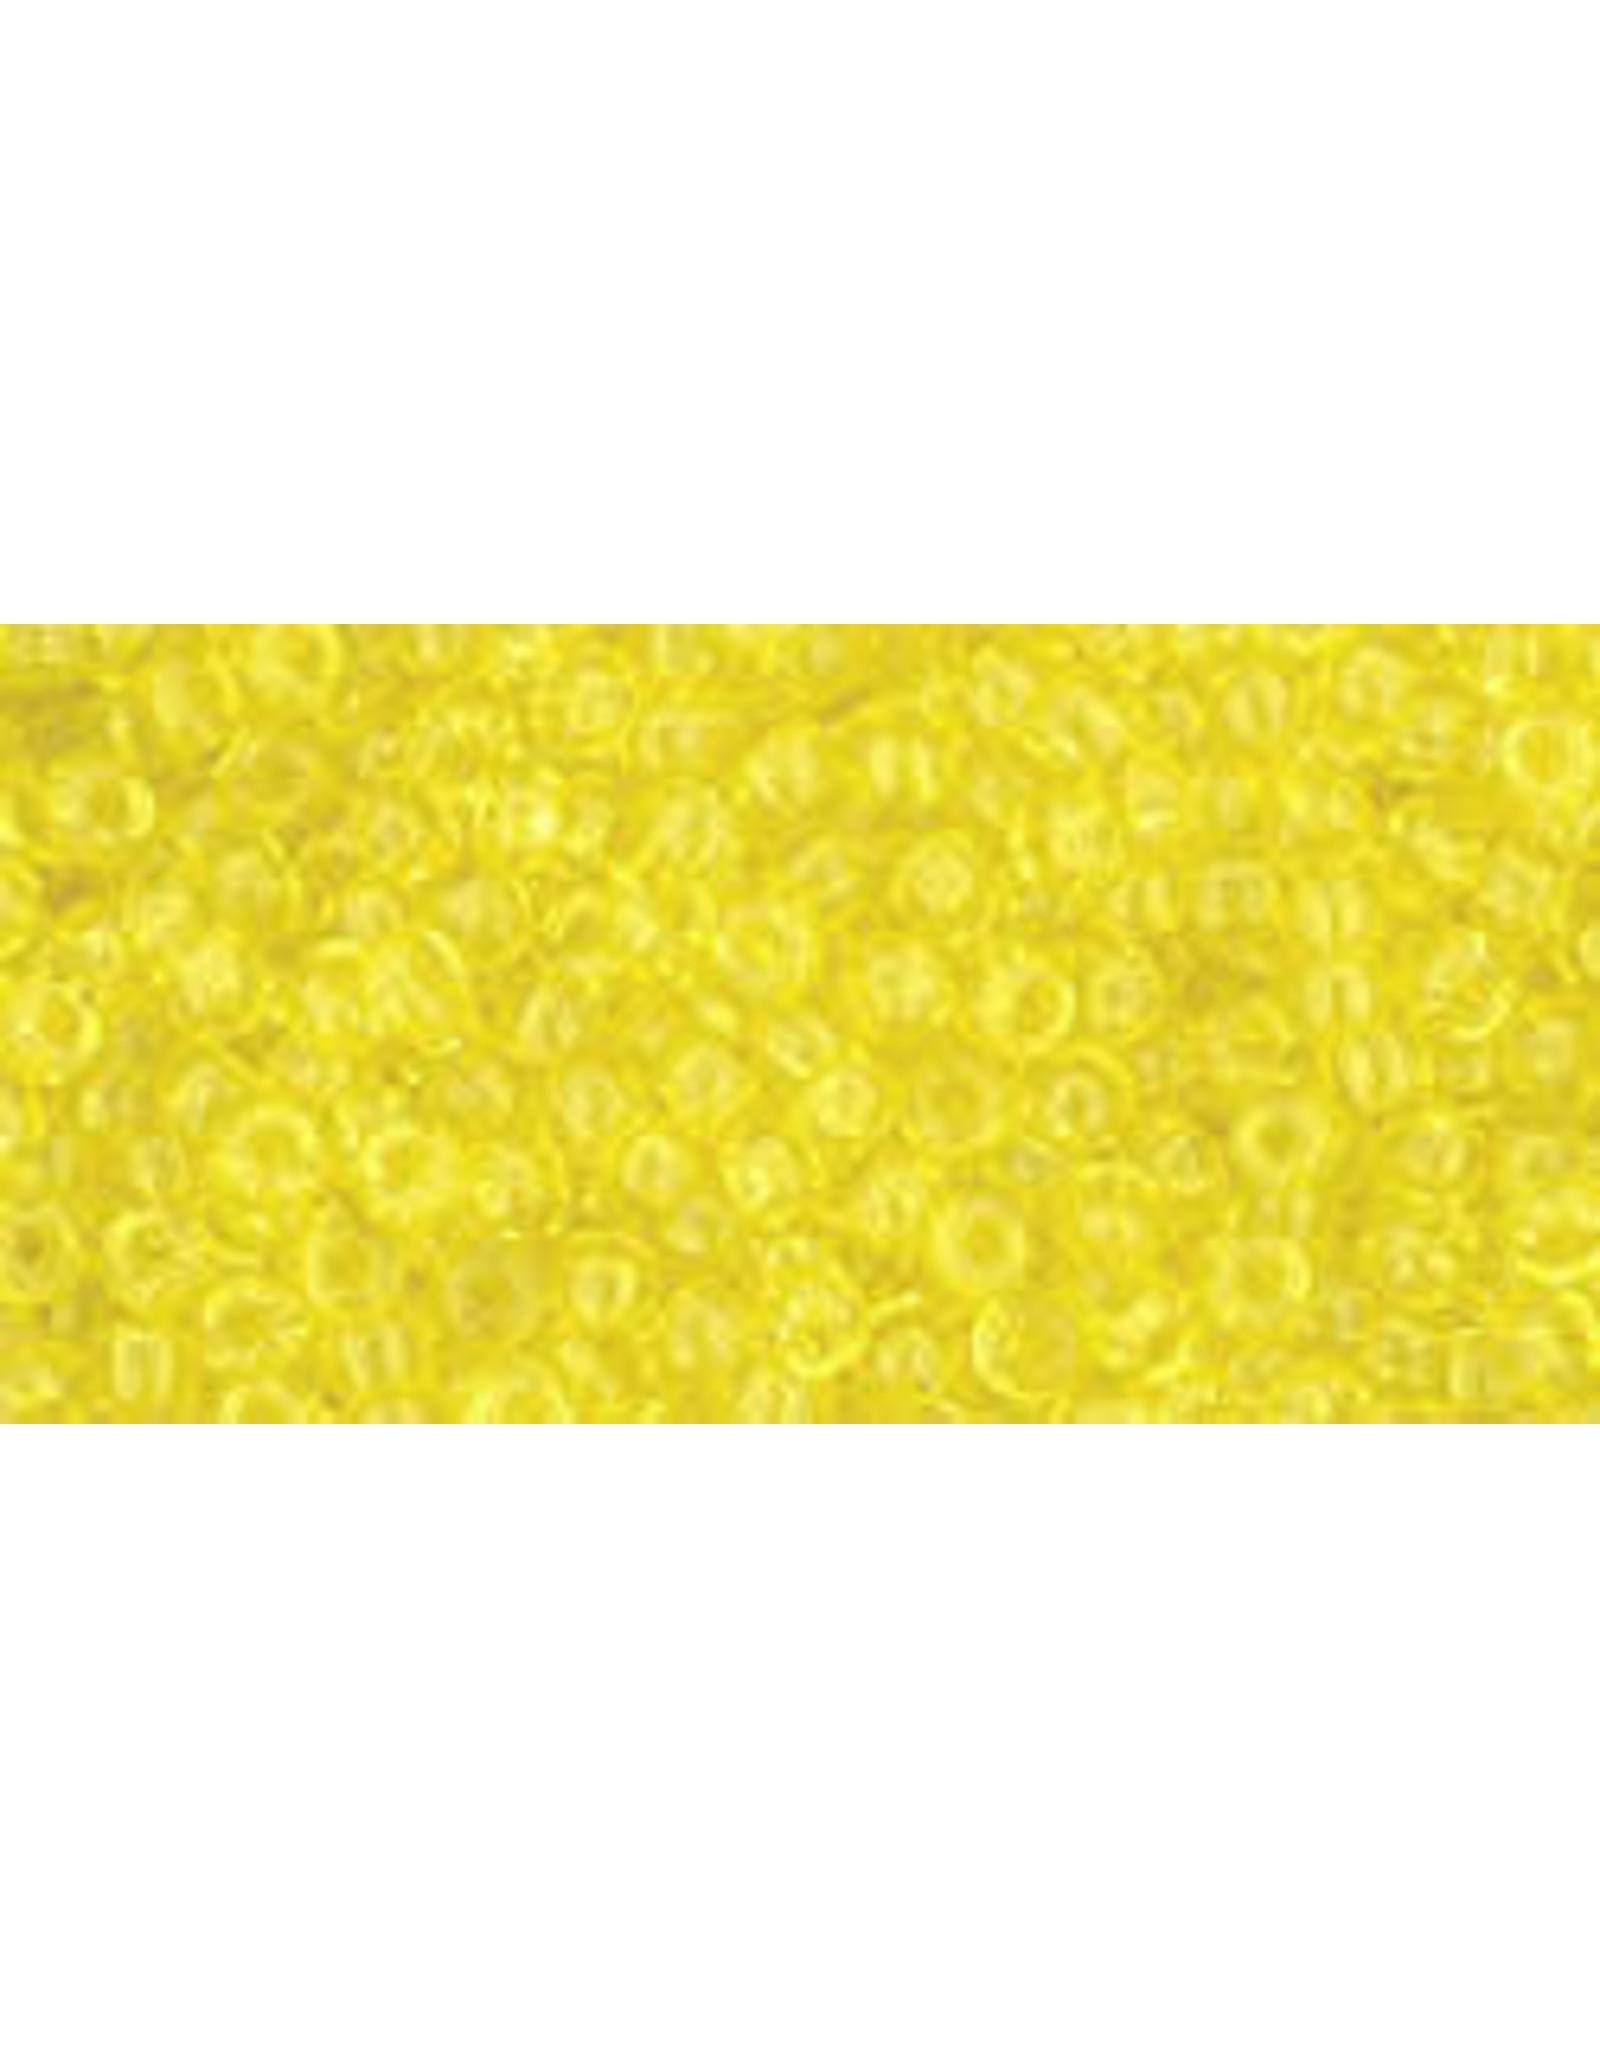 Toho 12 11 Toho Round 6g Transparent Lemon Yellow